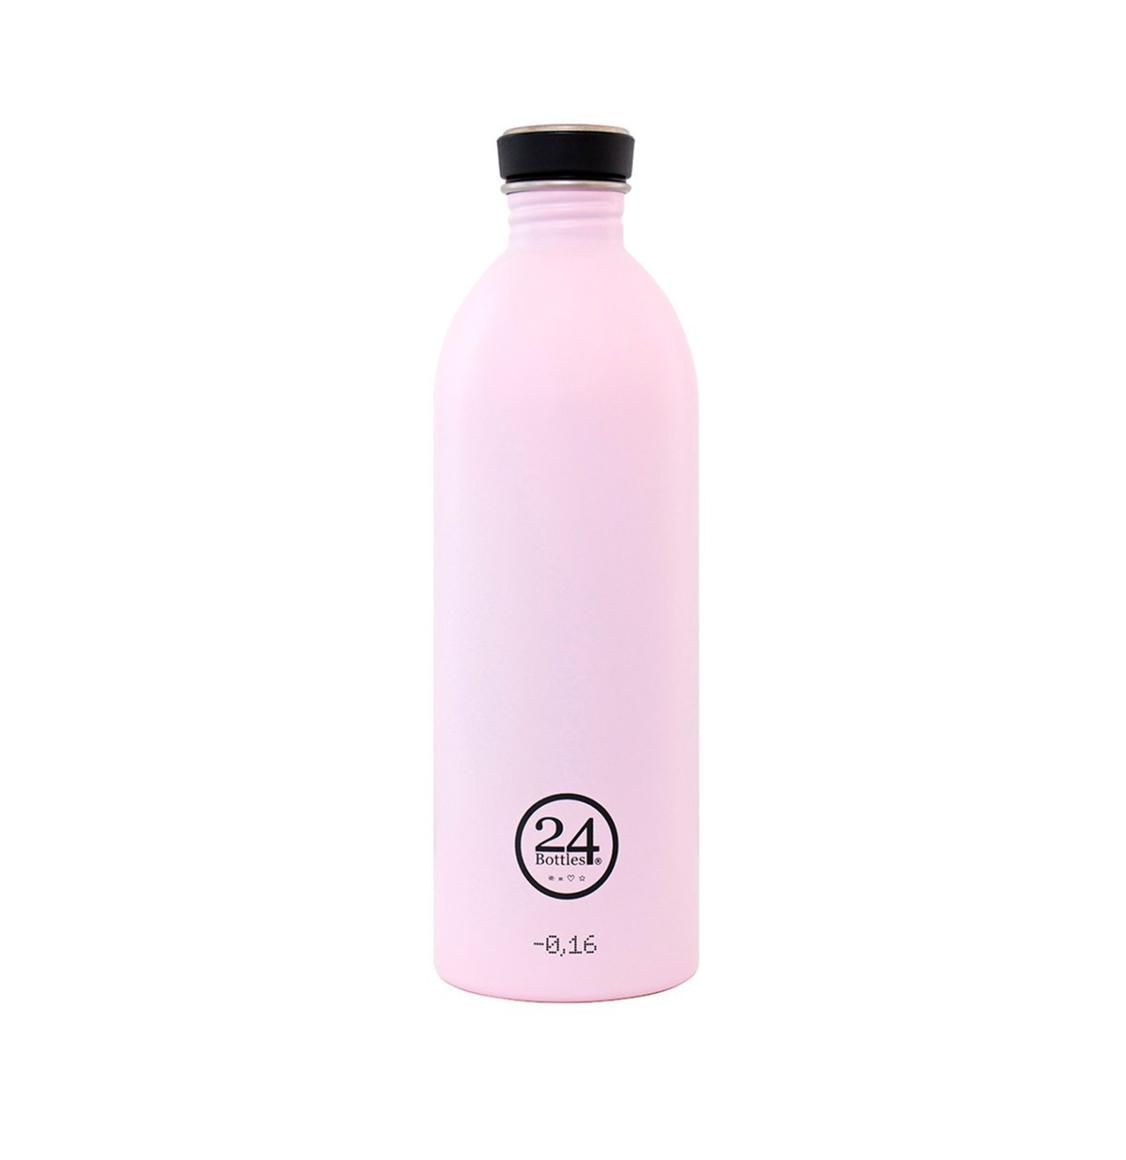 24Bottles Urban Bottle 1Lt Pink